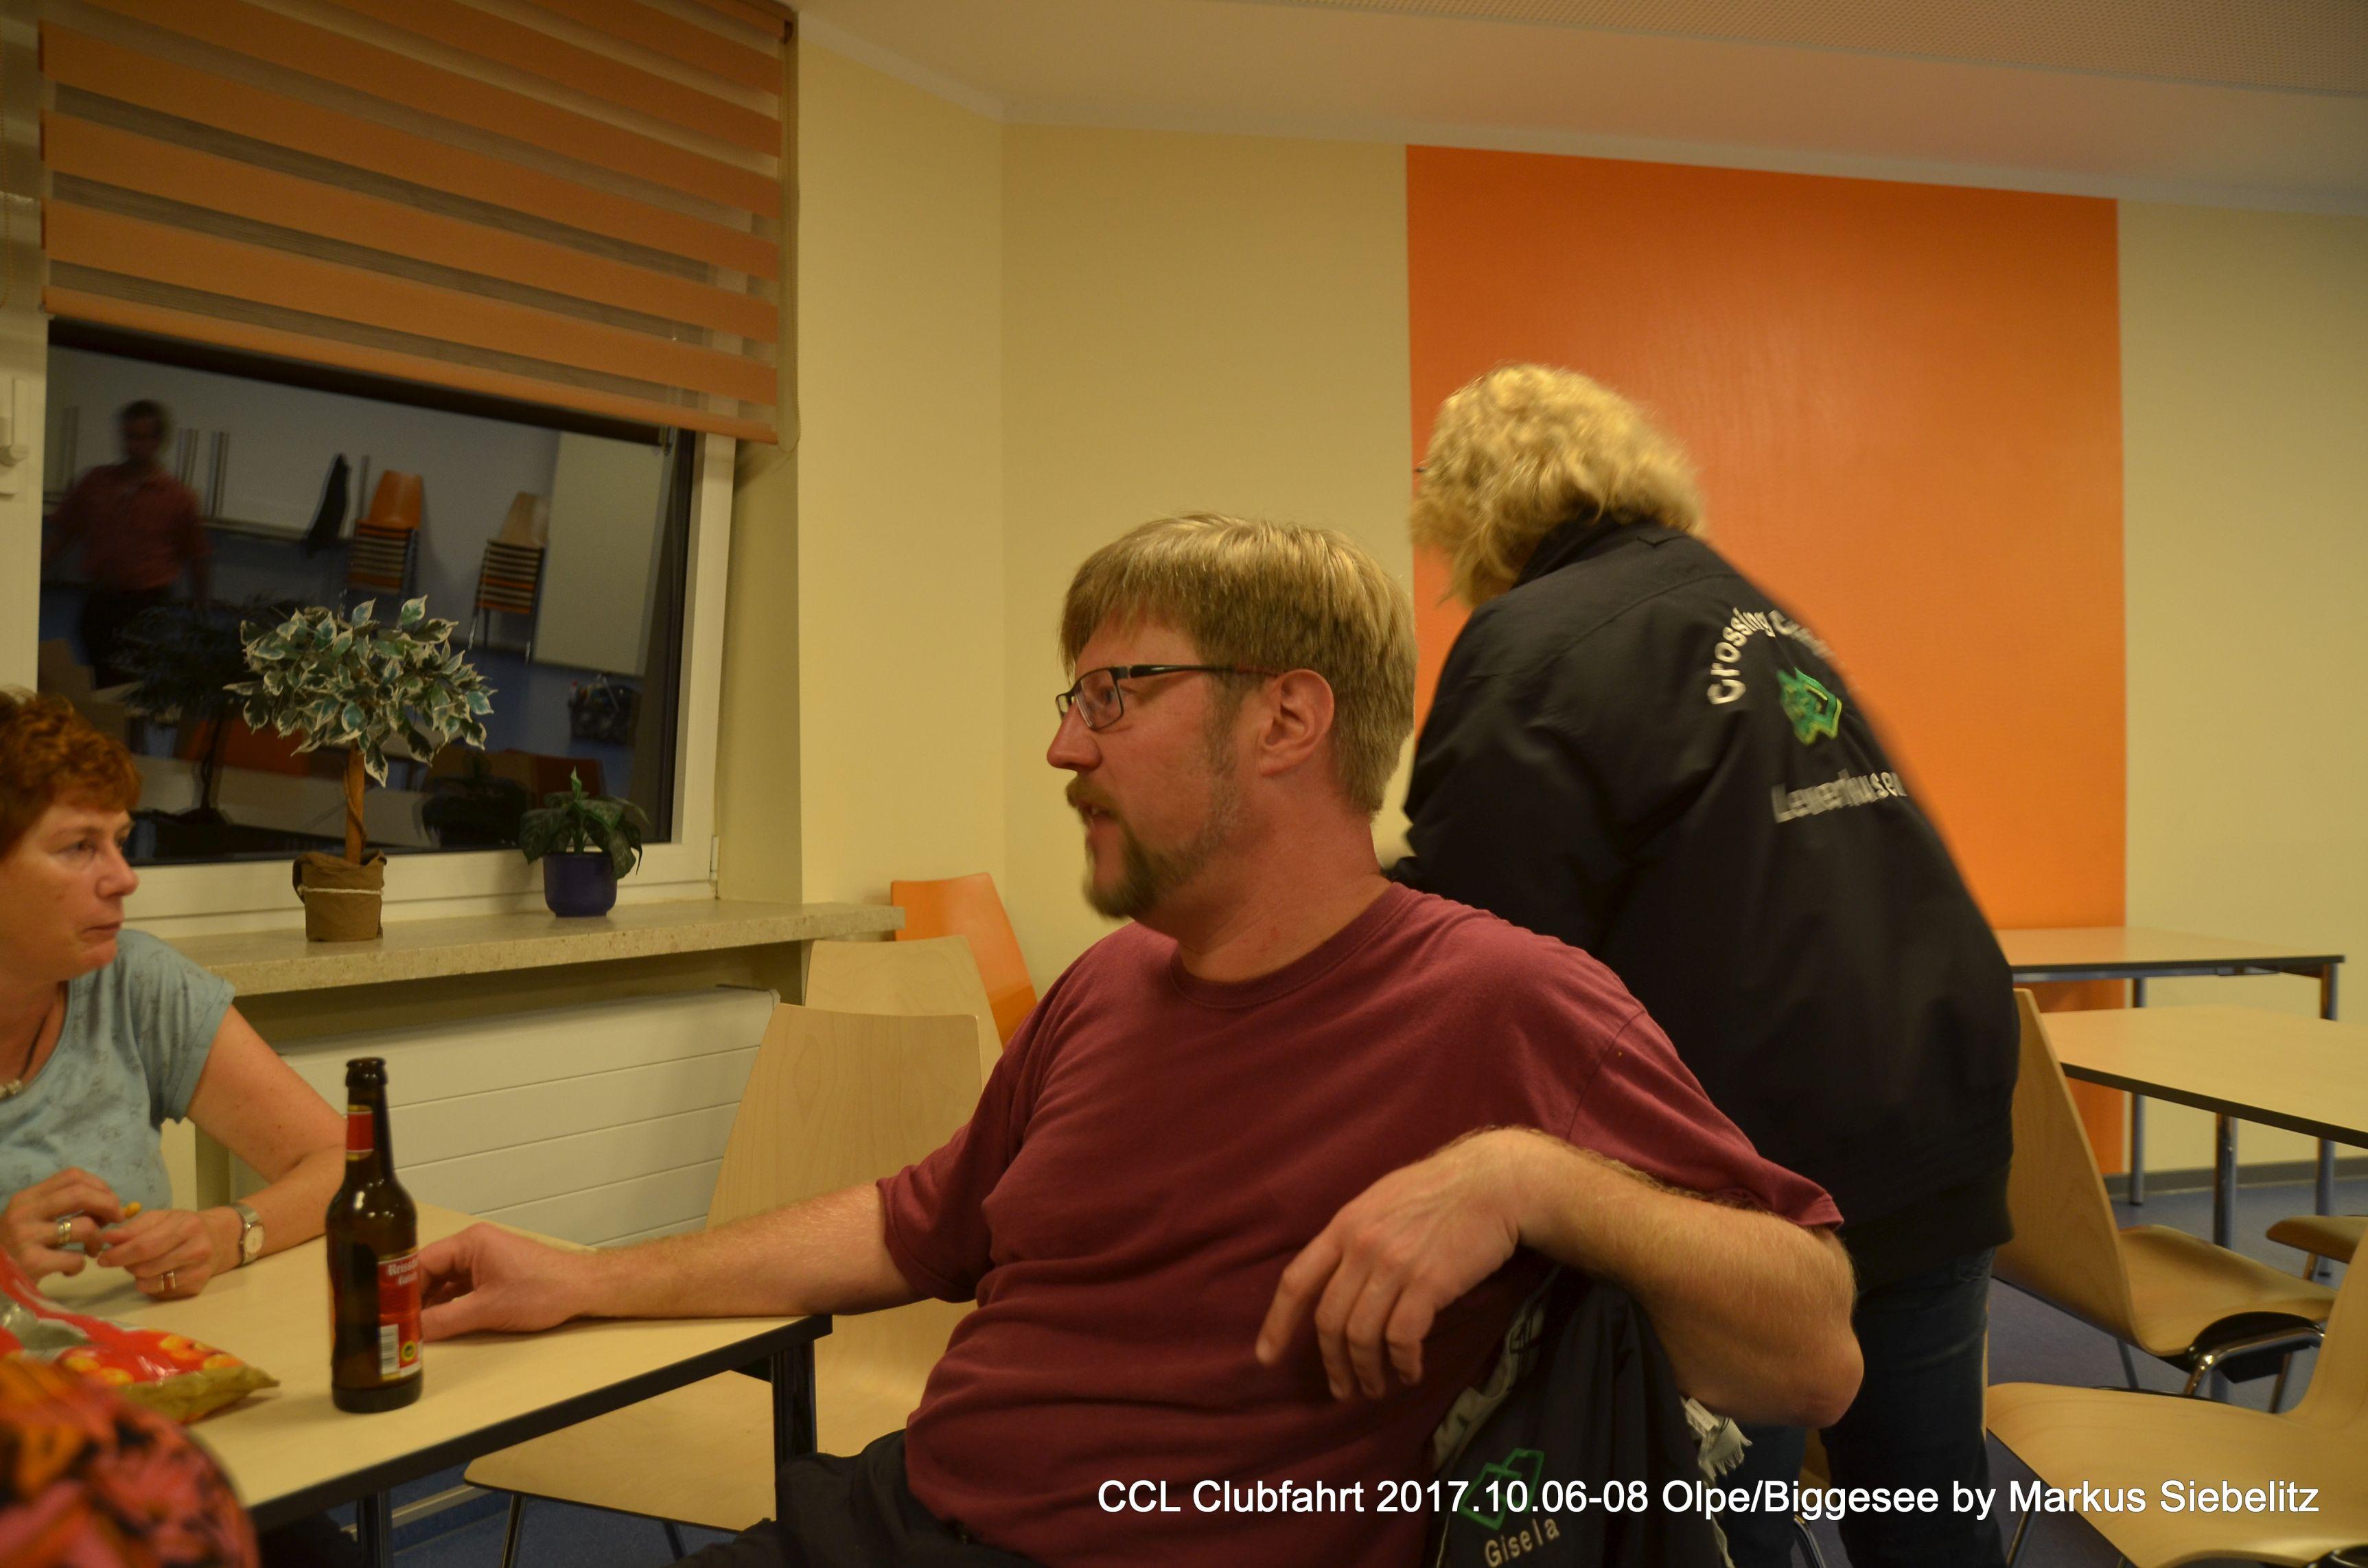 CCL Clubfahrt 2017.10.06-08 Biggesee (21)